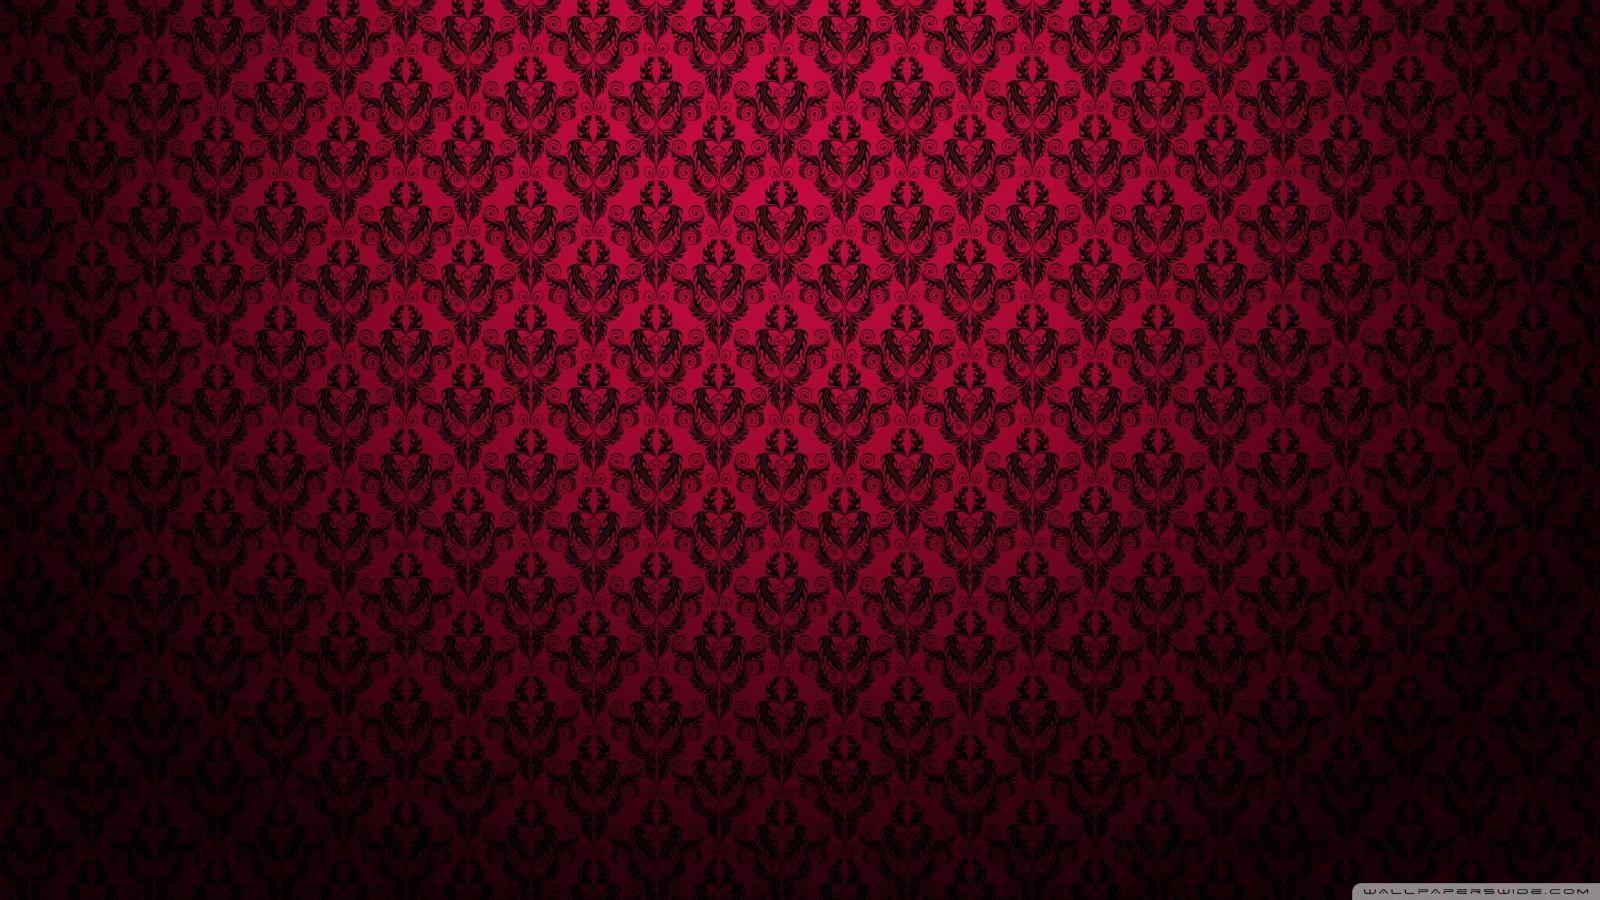 Background Pattern Red Lastest Red Pattern Hd Desktop Wallpaper Widescreen High Definition Within Backgro Pink Damask Wallpaper Pattern Wallpapers Red Damask